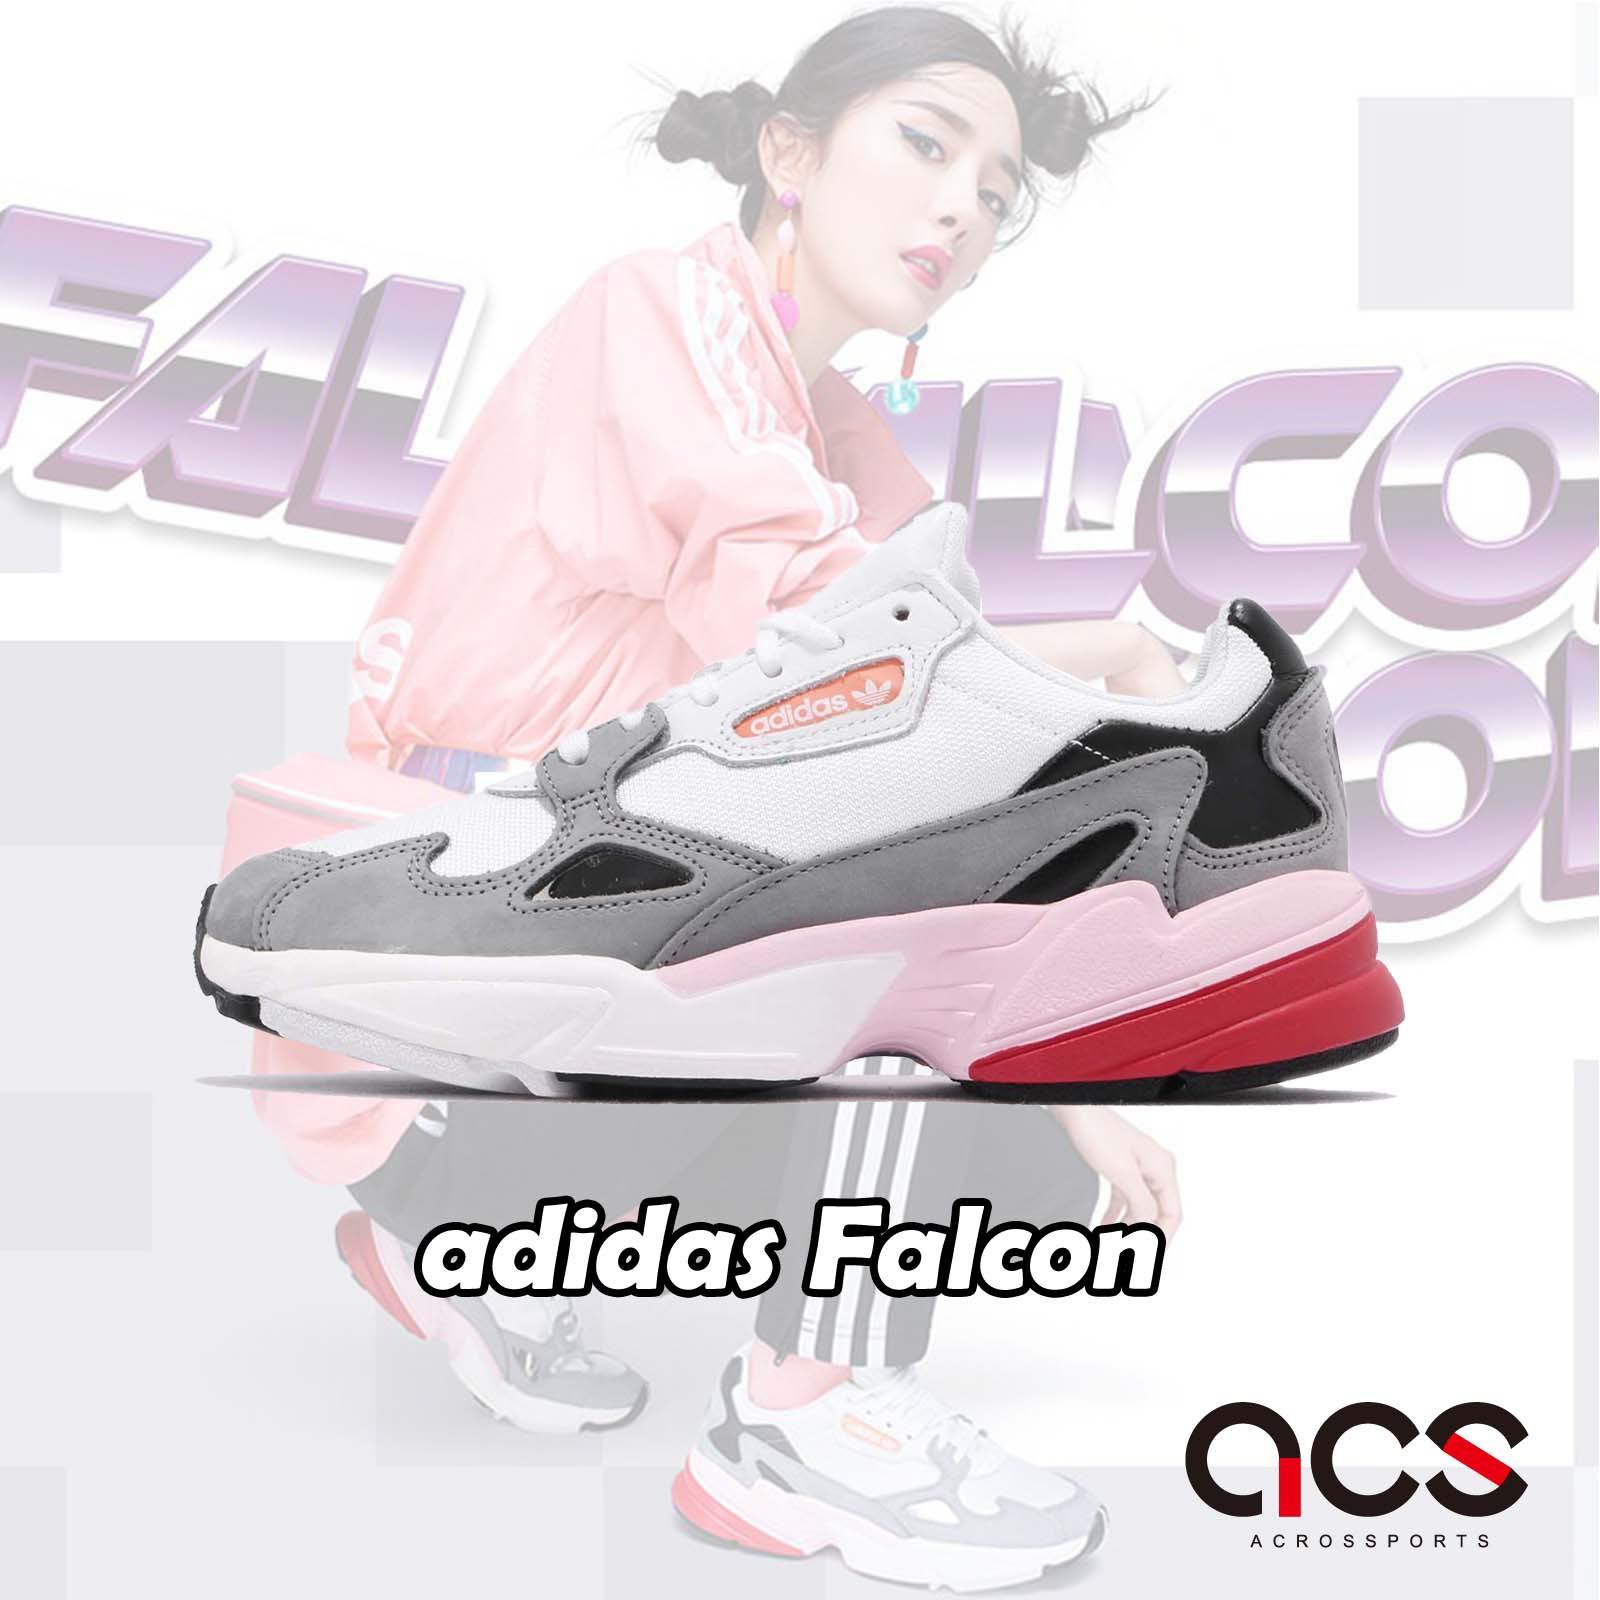 adidas 老爹鞋 Falcon W 灰 粉紅 麂皮鞋面 復古 老爺鞋 爸爸鞋 運動鞋 女鞋 CG6214【ACS】